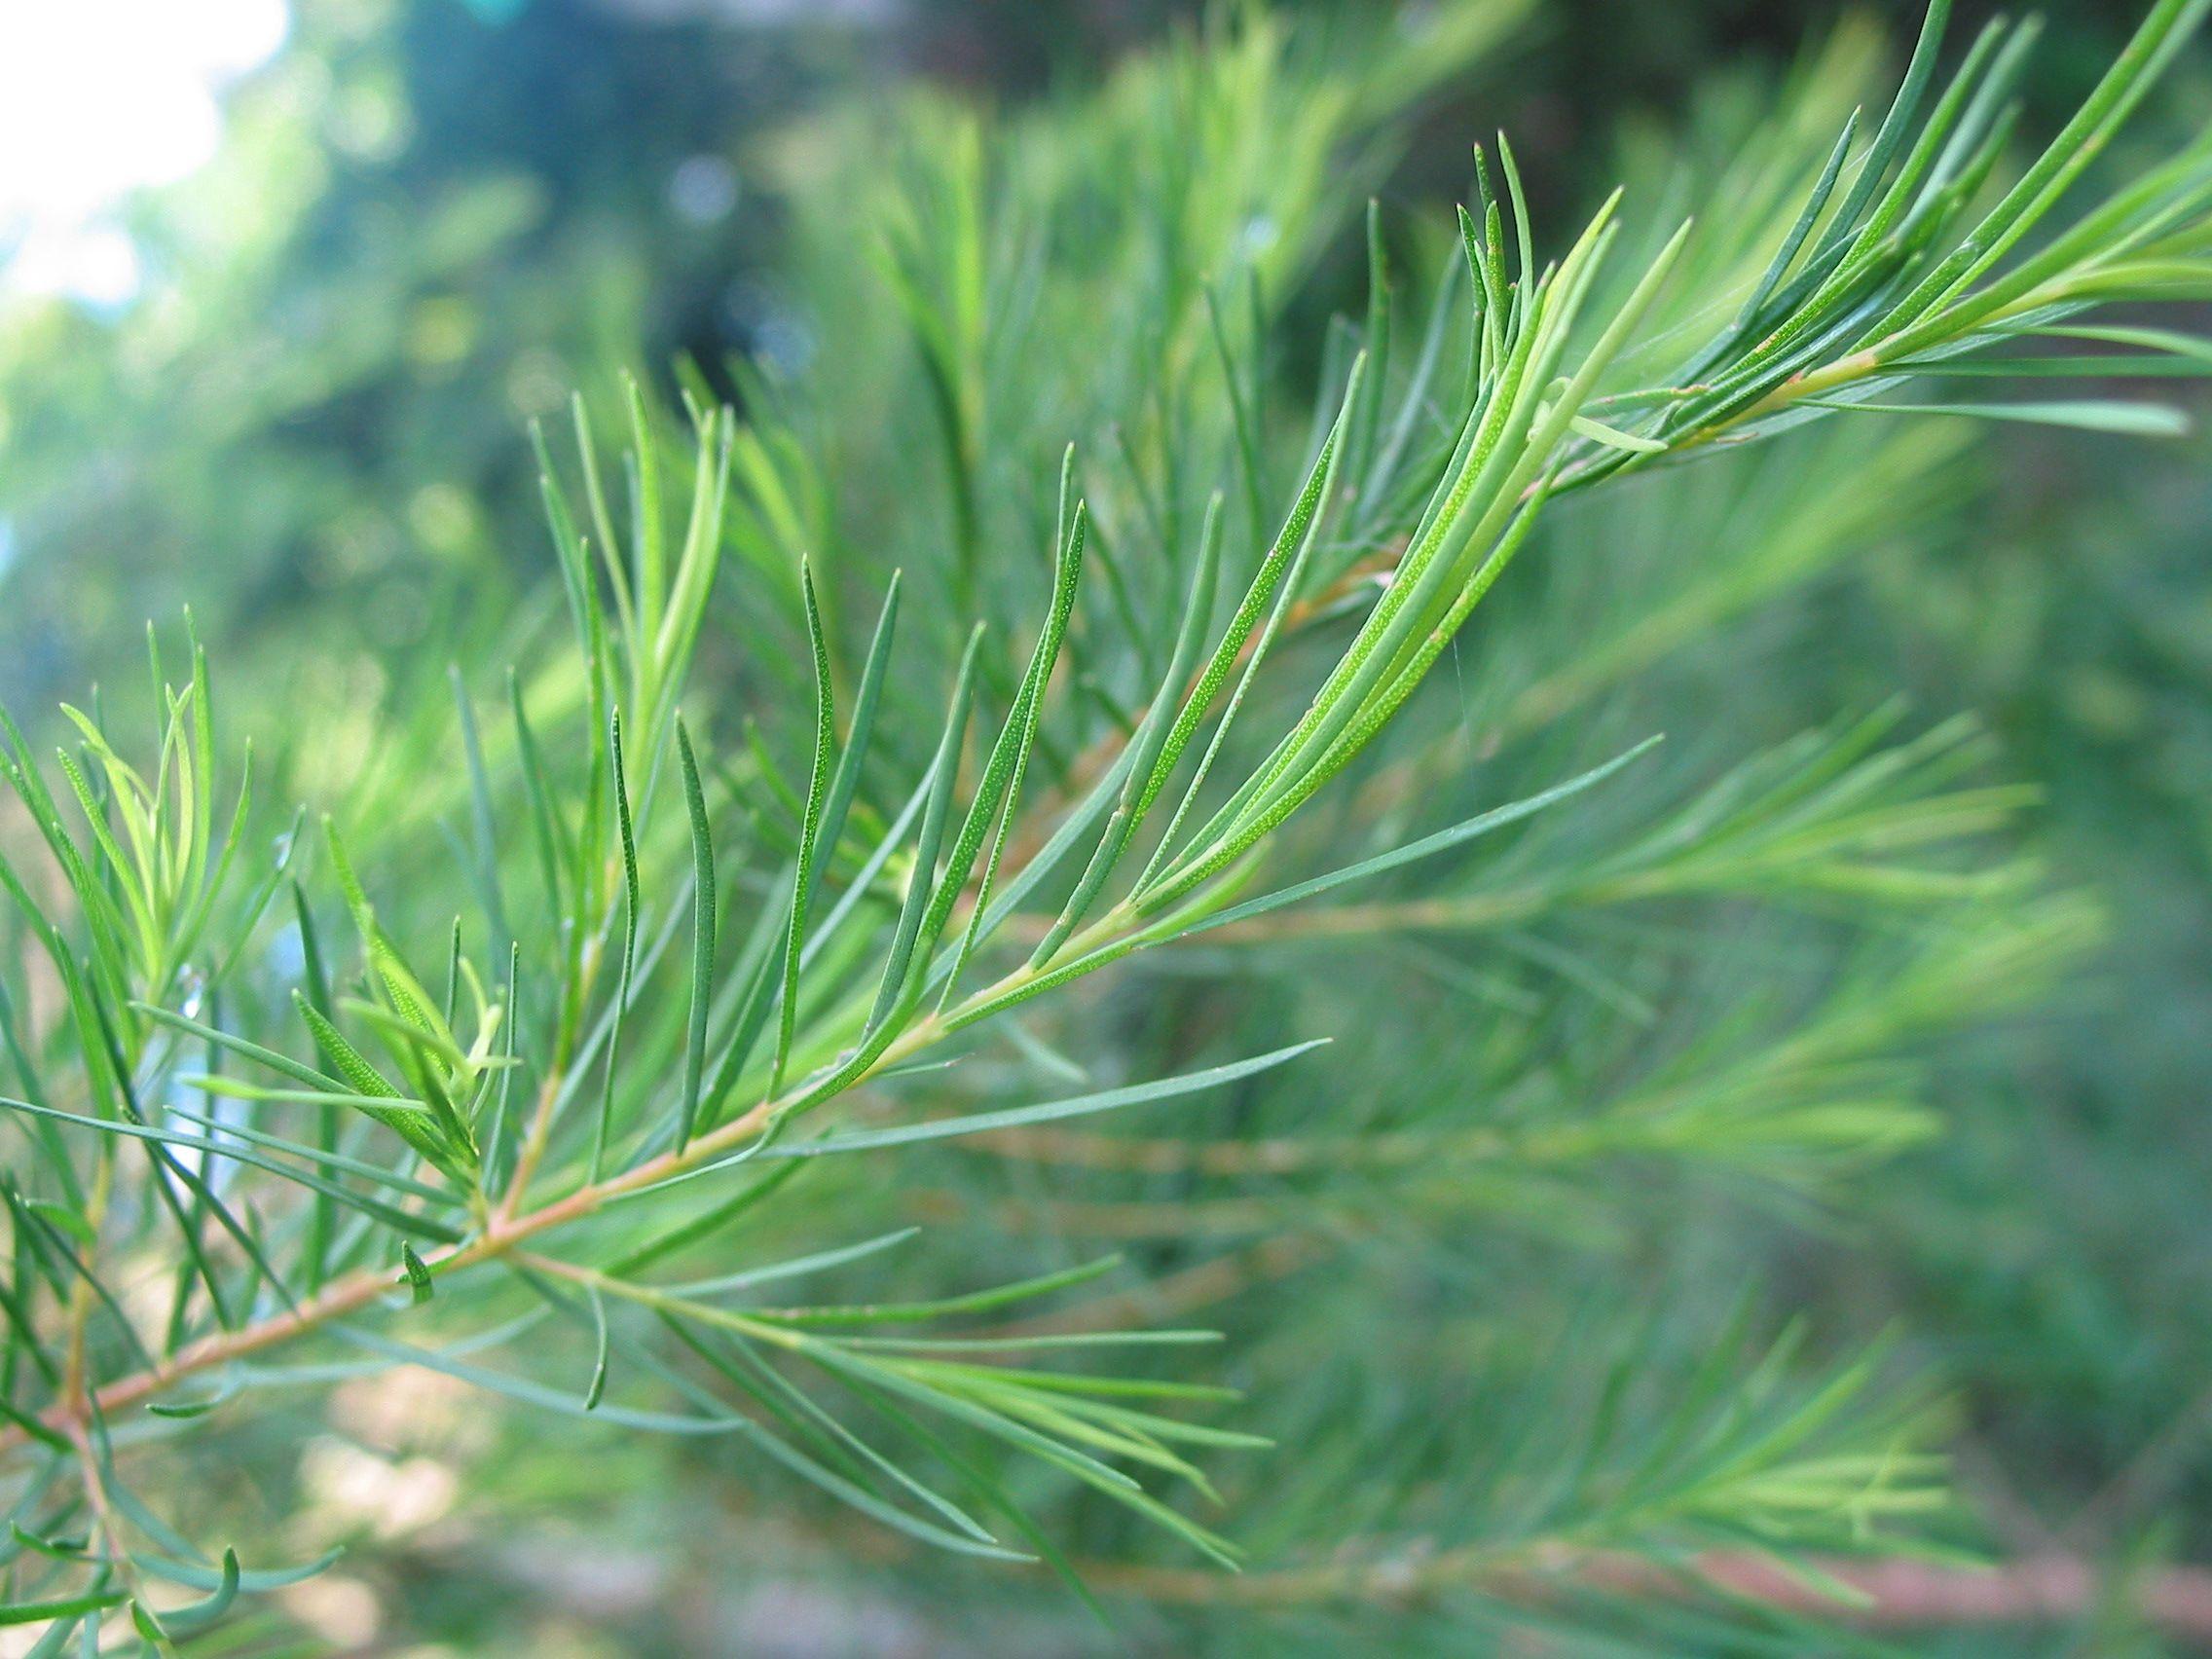 Aromatic Medicine for Boils | Essential oils, Melaleuca, Herbs